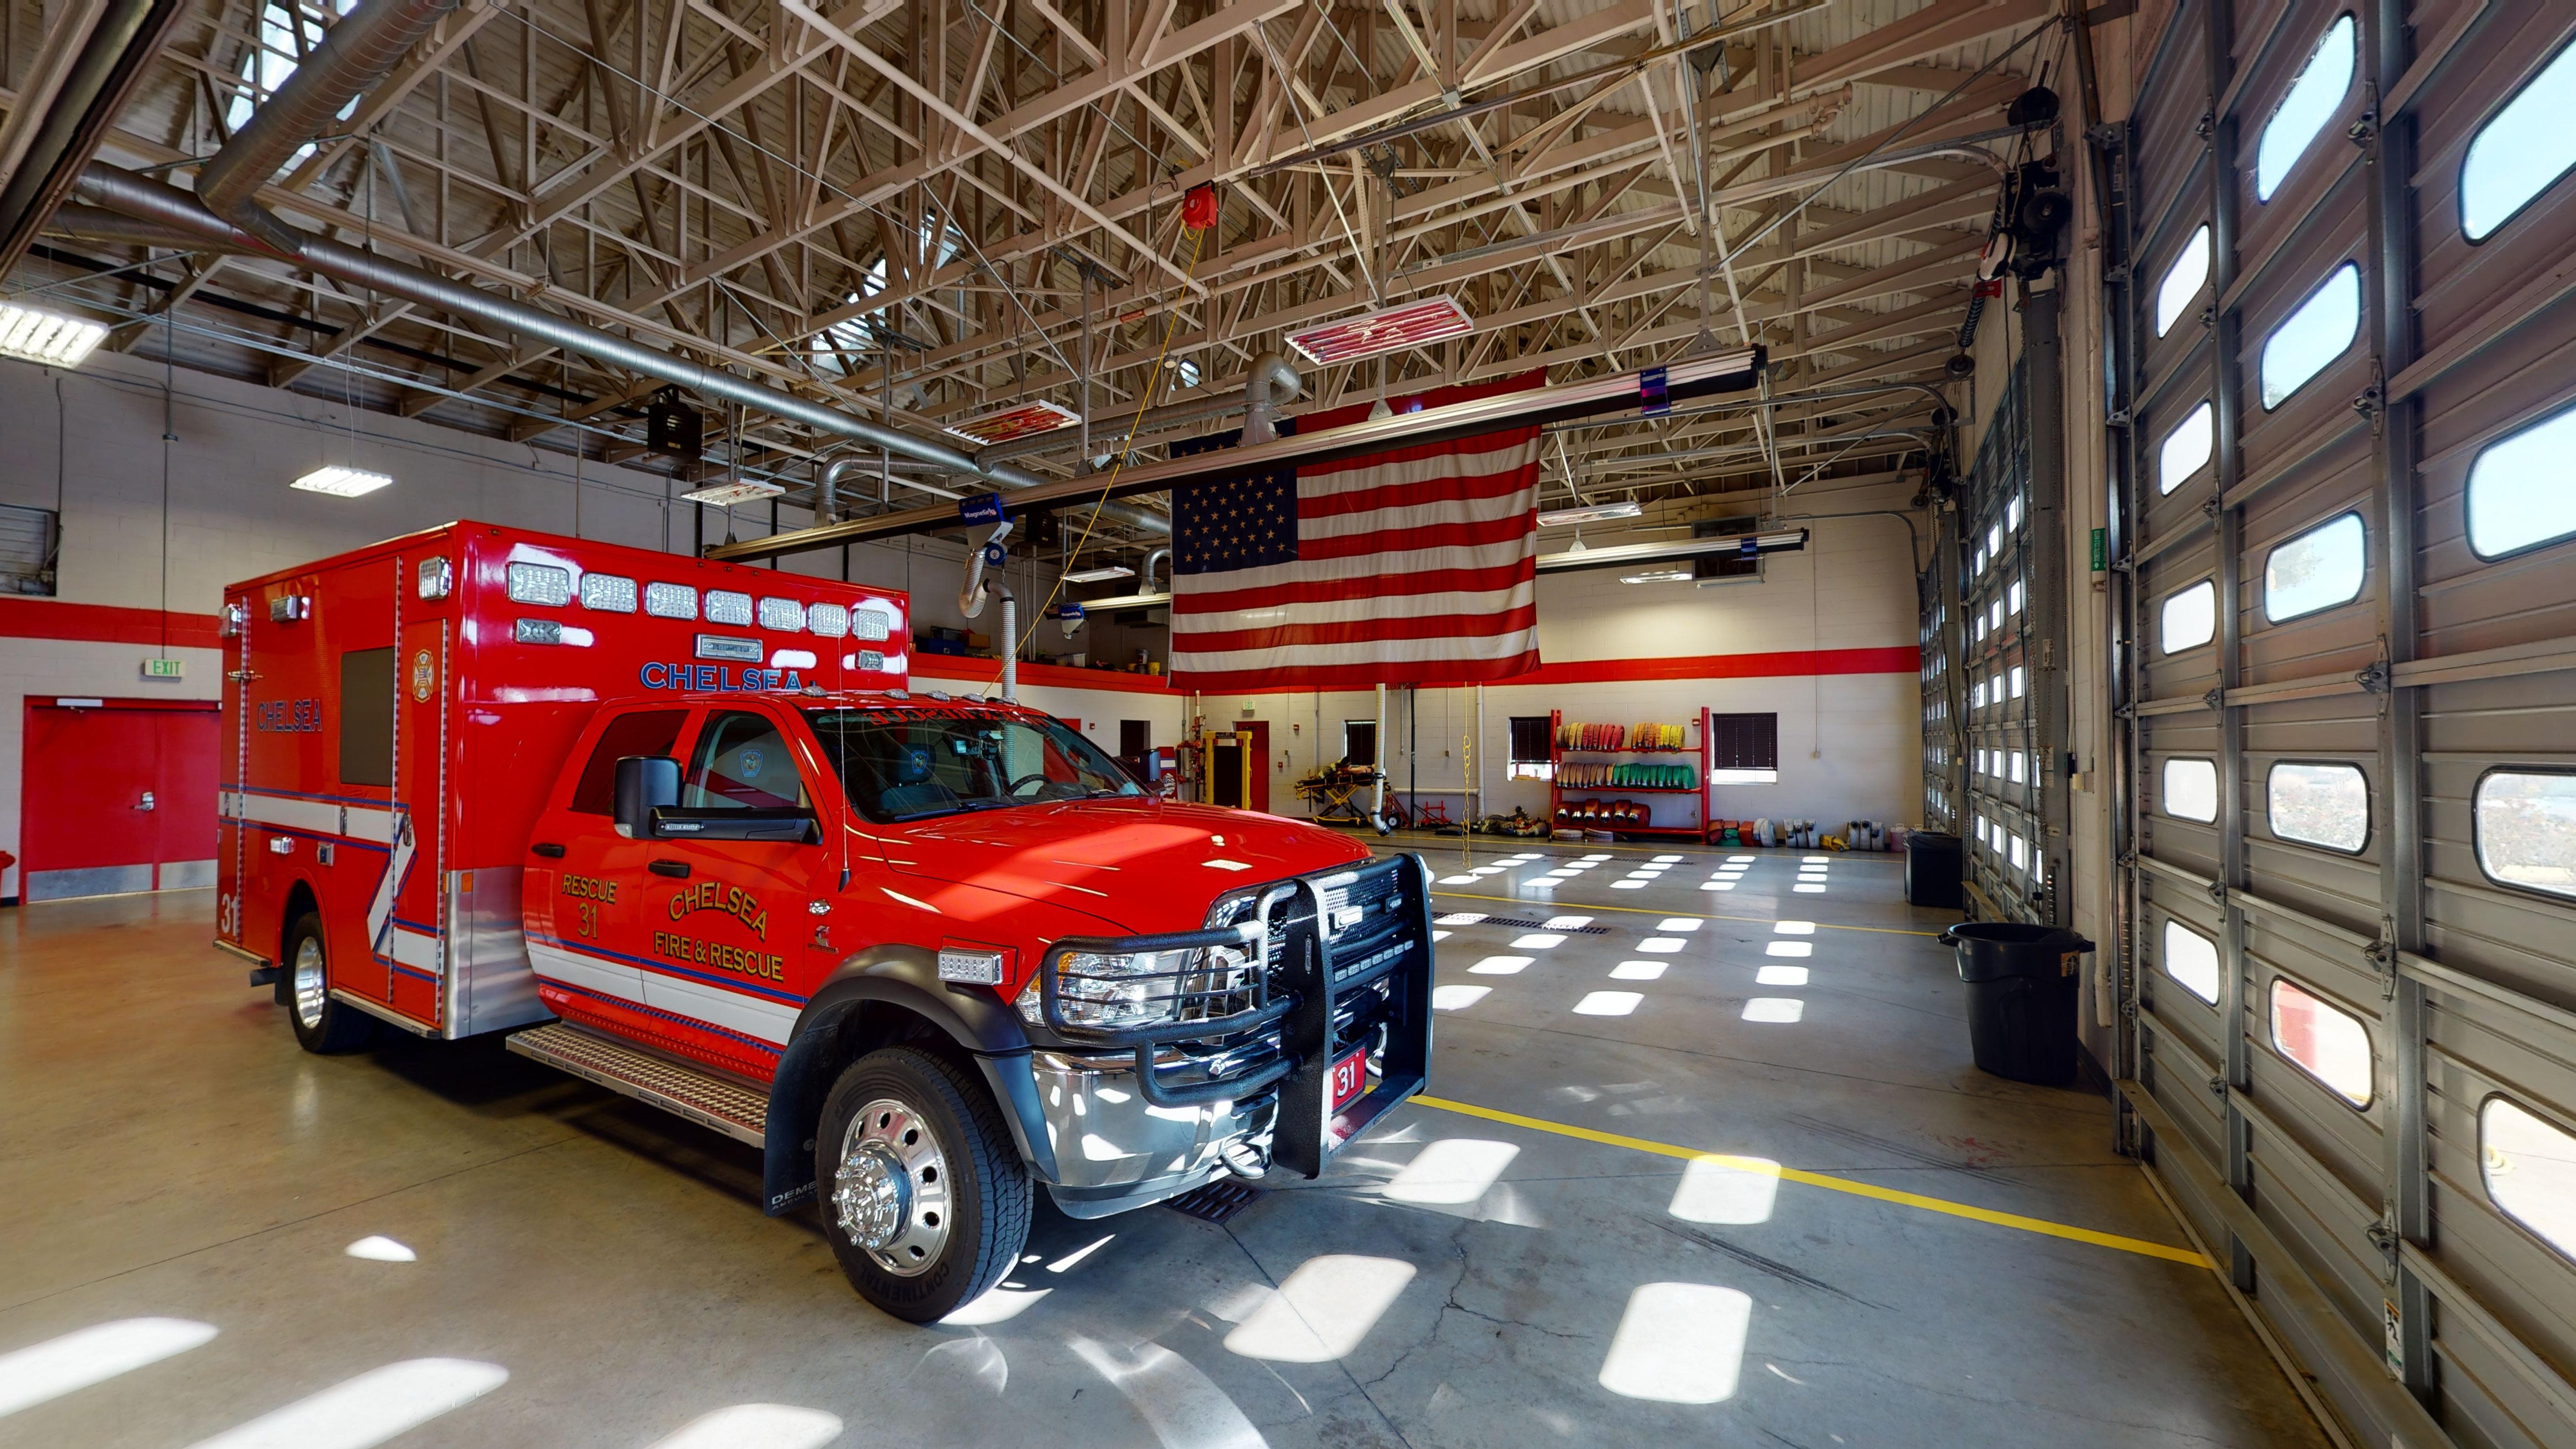 5_Chelsea-Fire-Rescue-Demers-151-06162021_101039